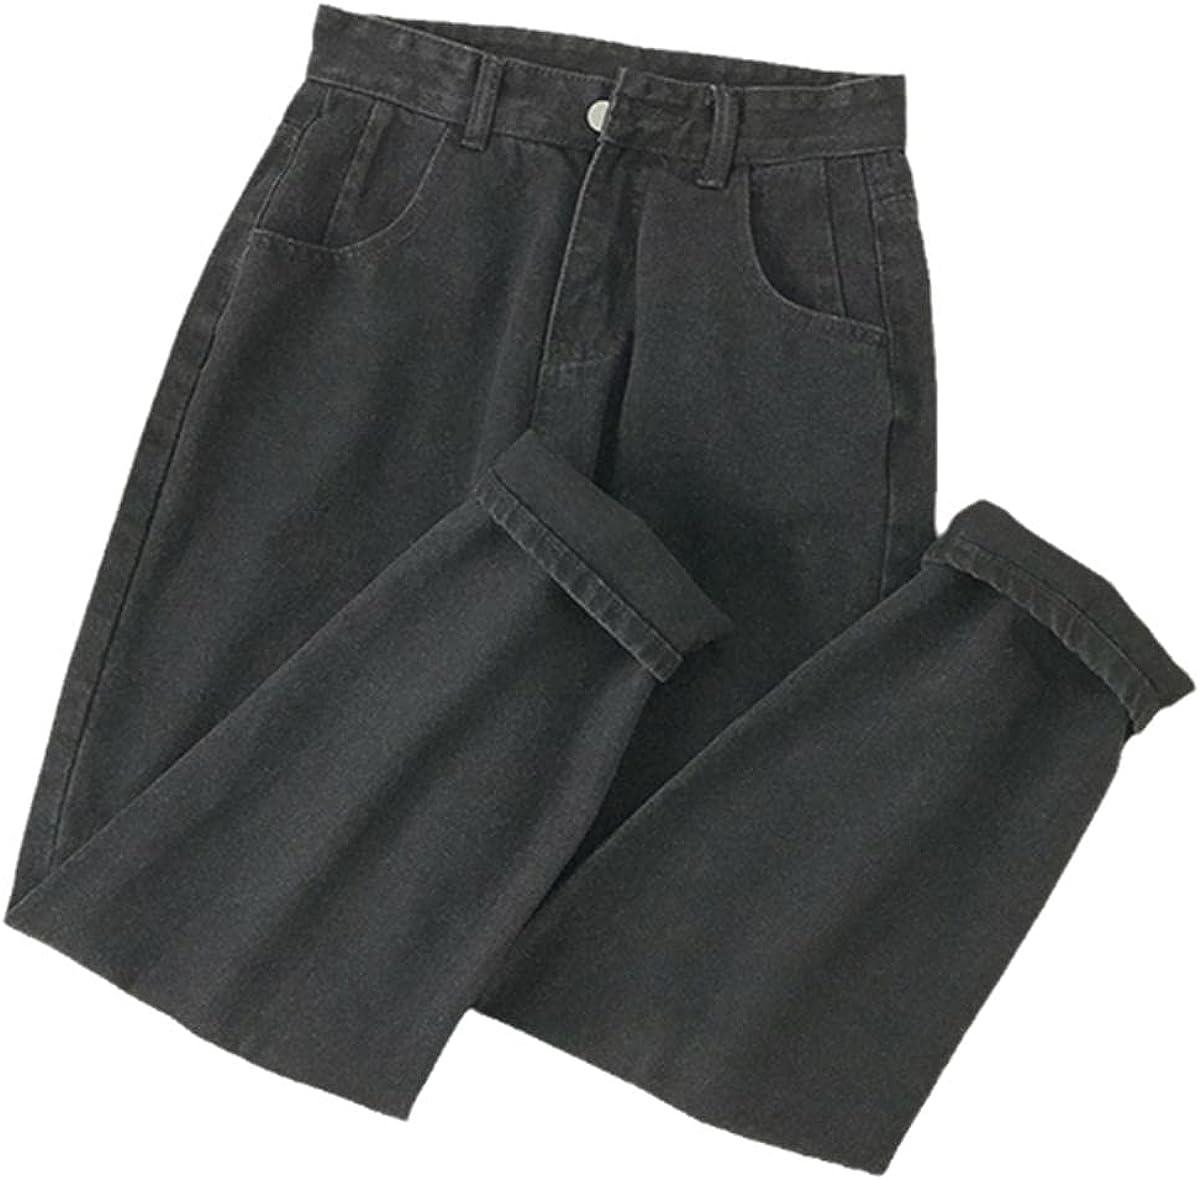 High Arlington Mall Waist Las Vegas Mall Jeans for Women Autumn Easy and Winter Matc Retro New